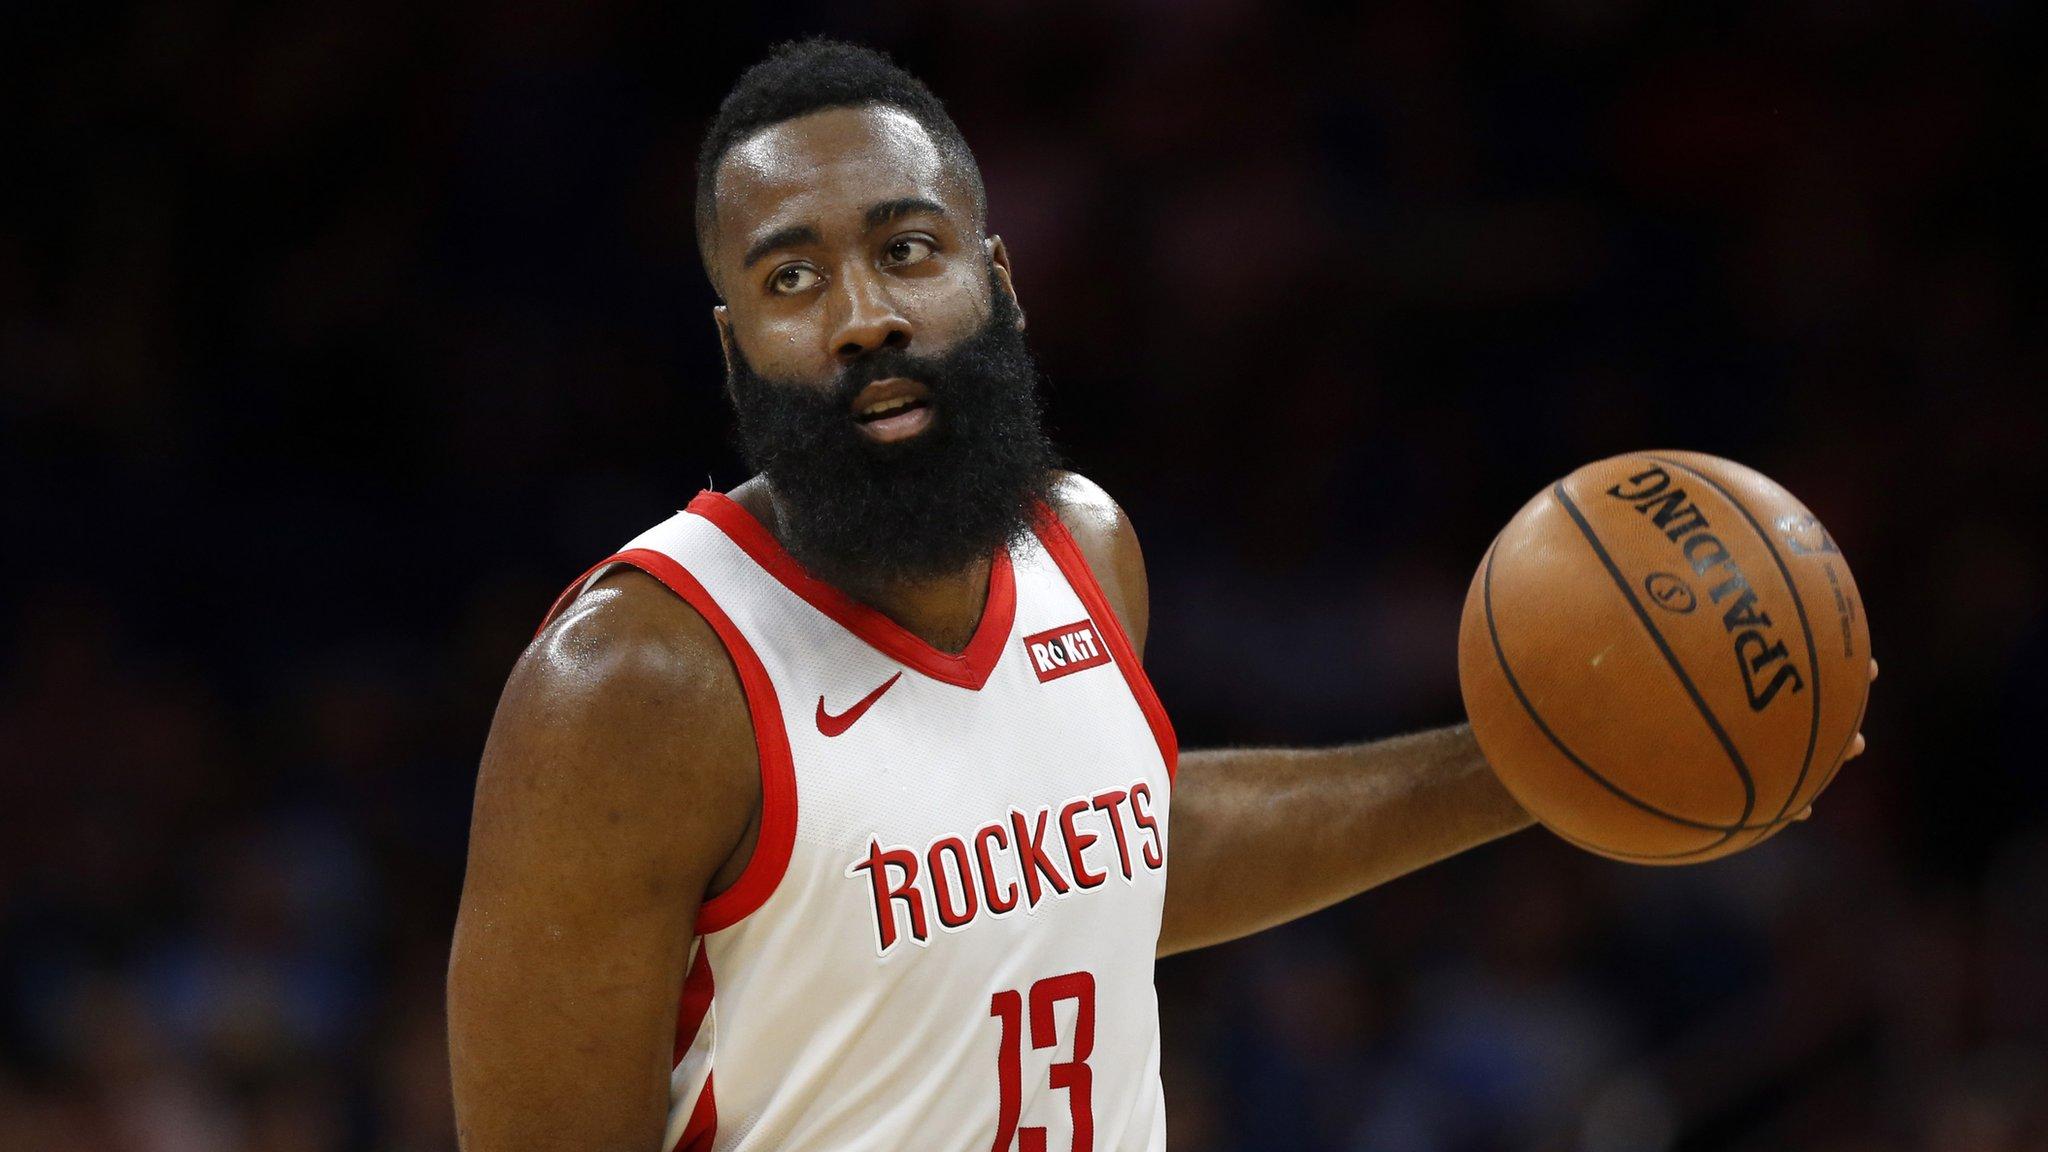 Houston Rockets: James Harden sets new NBA scoring record